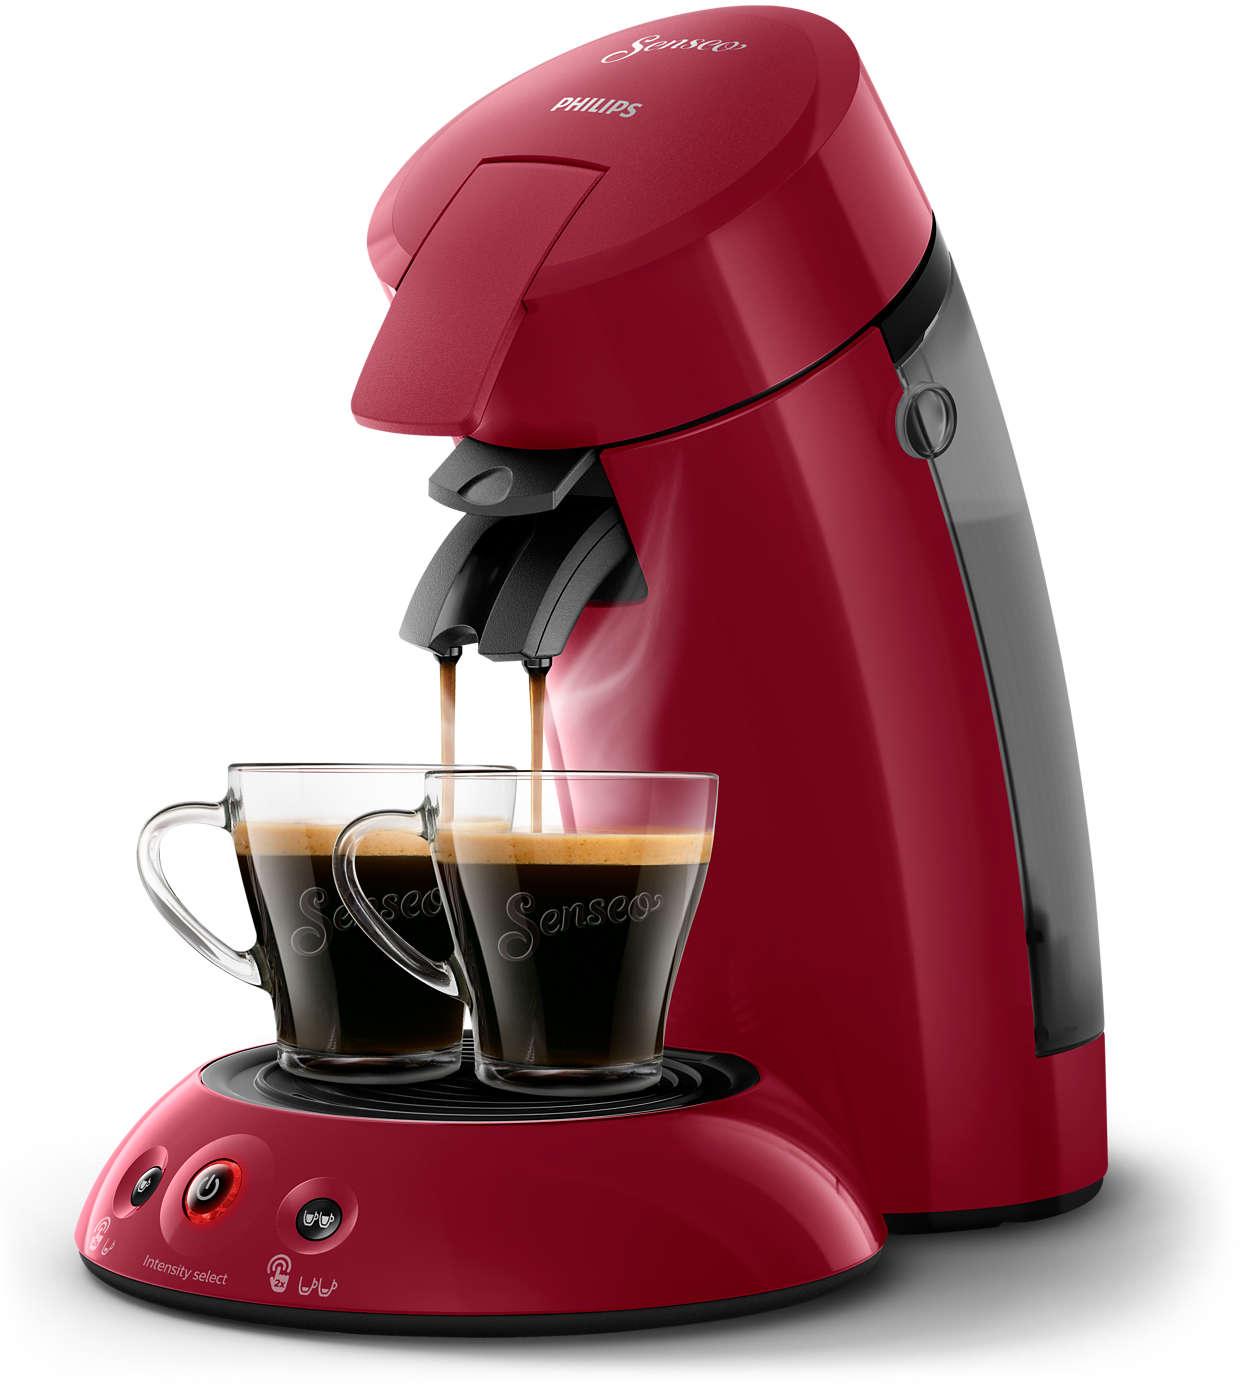 Philips Cafetiere-dosette PHILIPS - Senseo Original Rouge 0.7 L (HD6554/91)